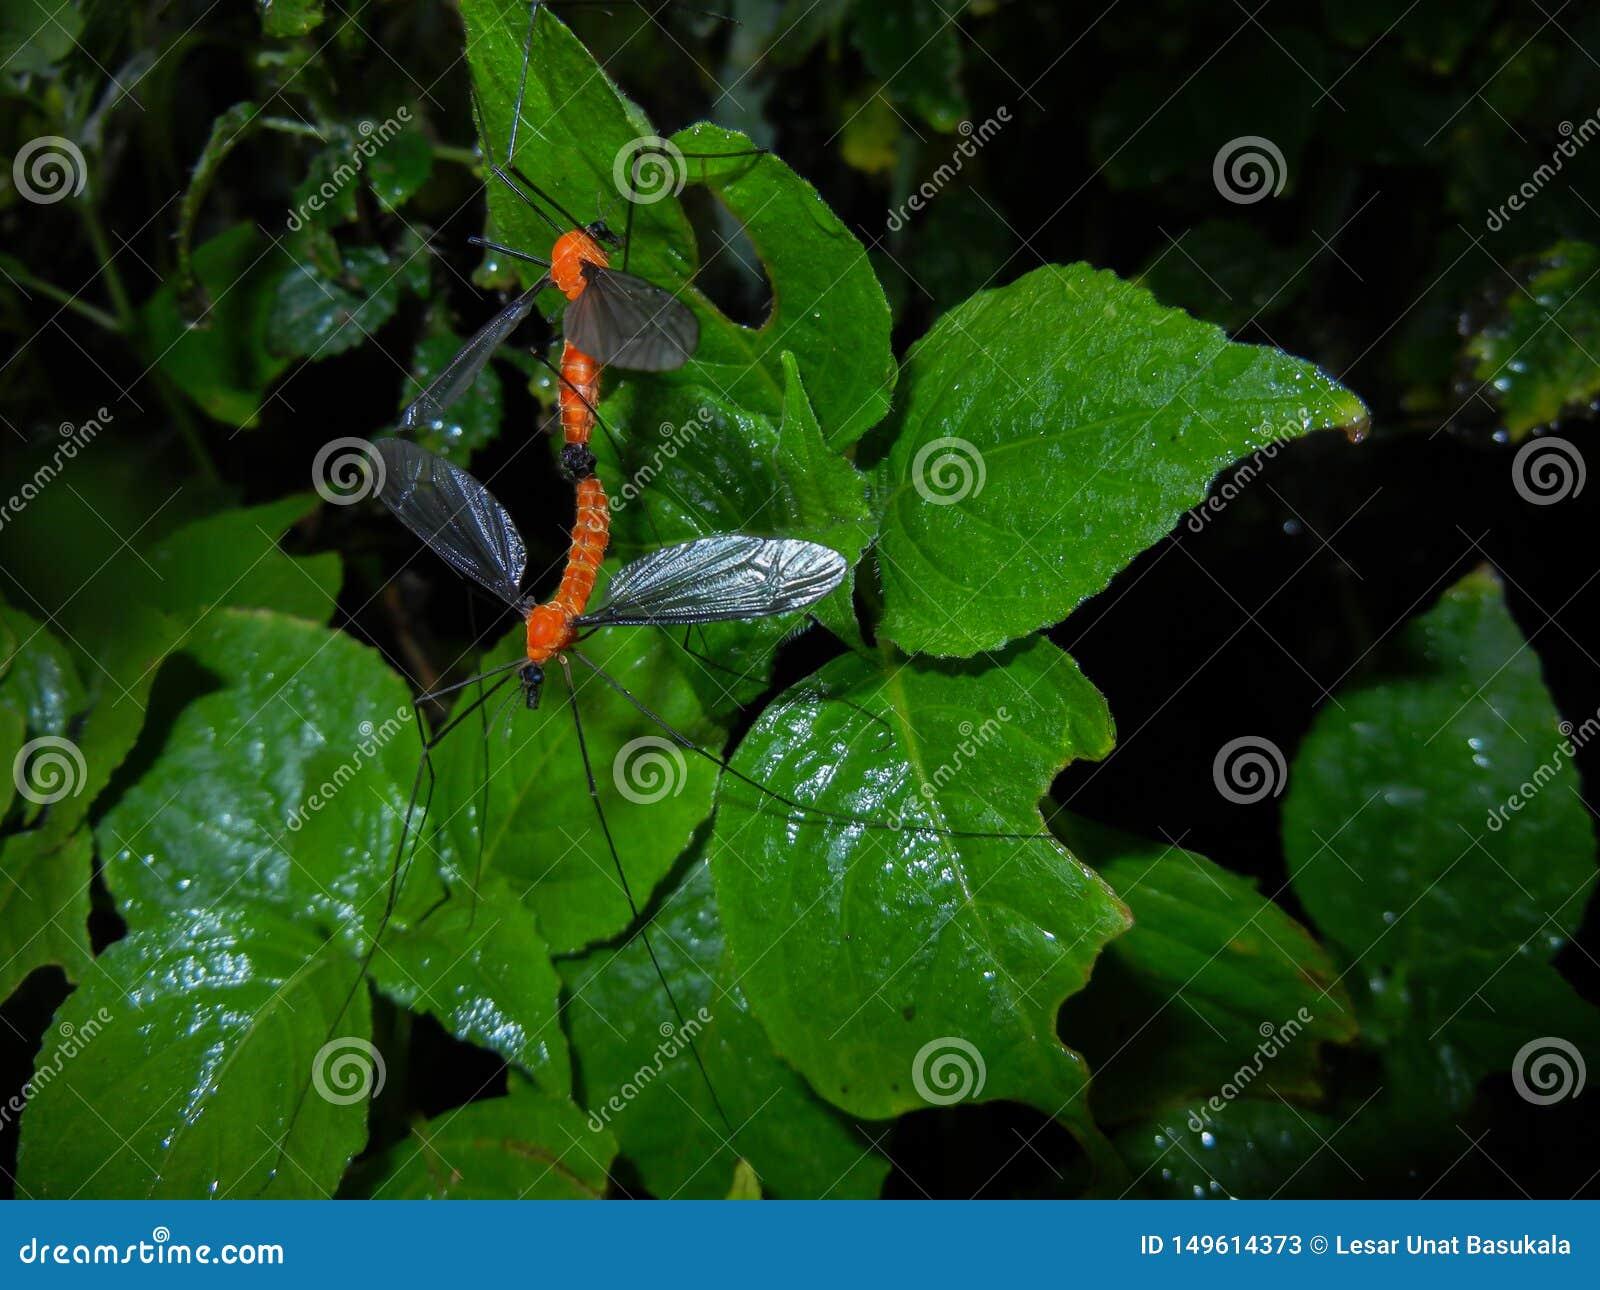 Cran fluga som parar ihop, Insecta, Diptera, Tipulidae som parar ihop krypet